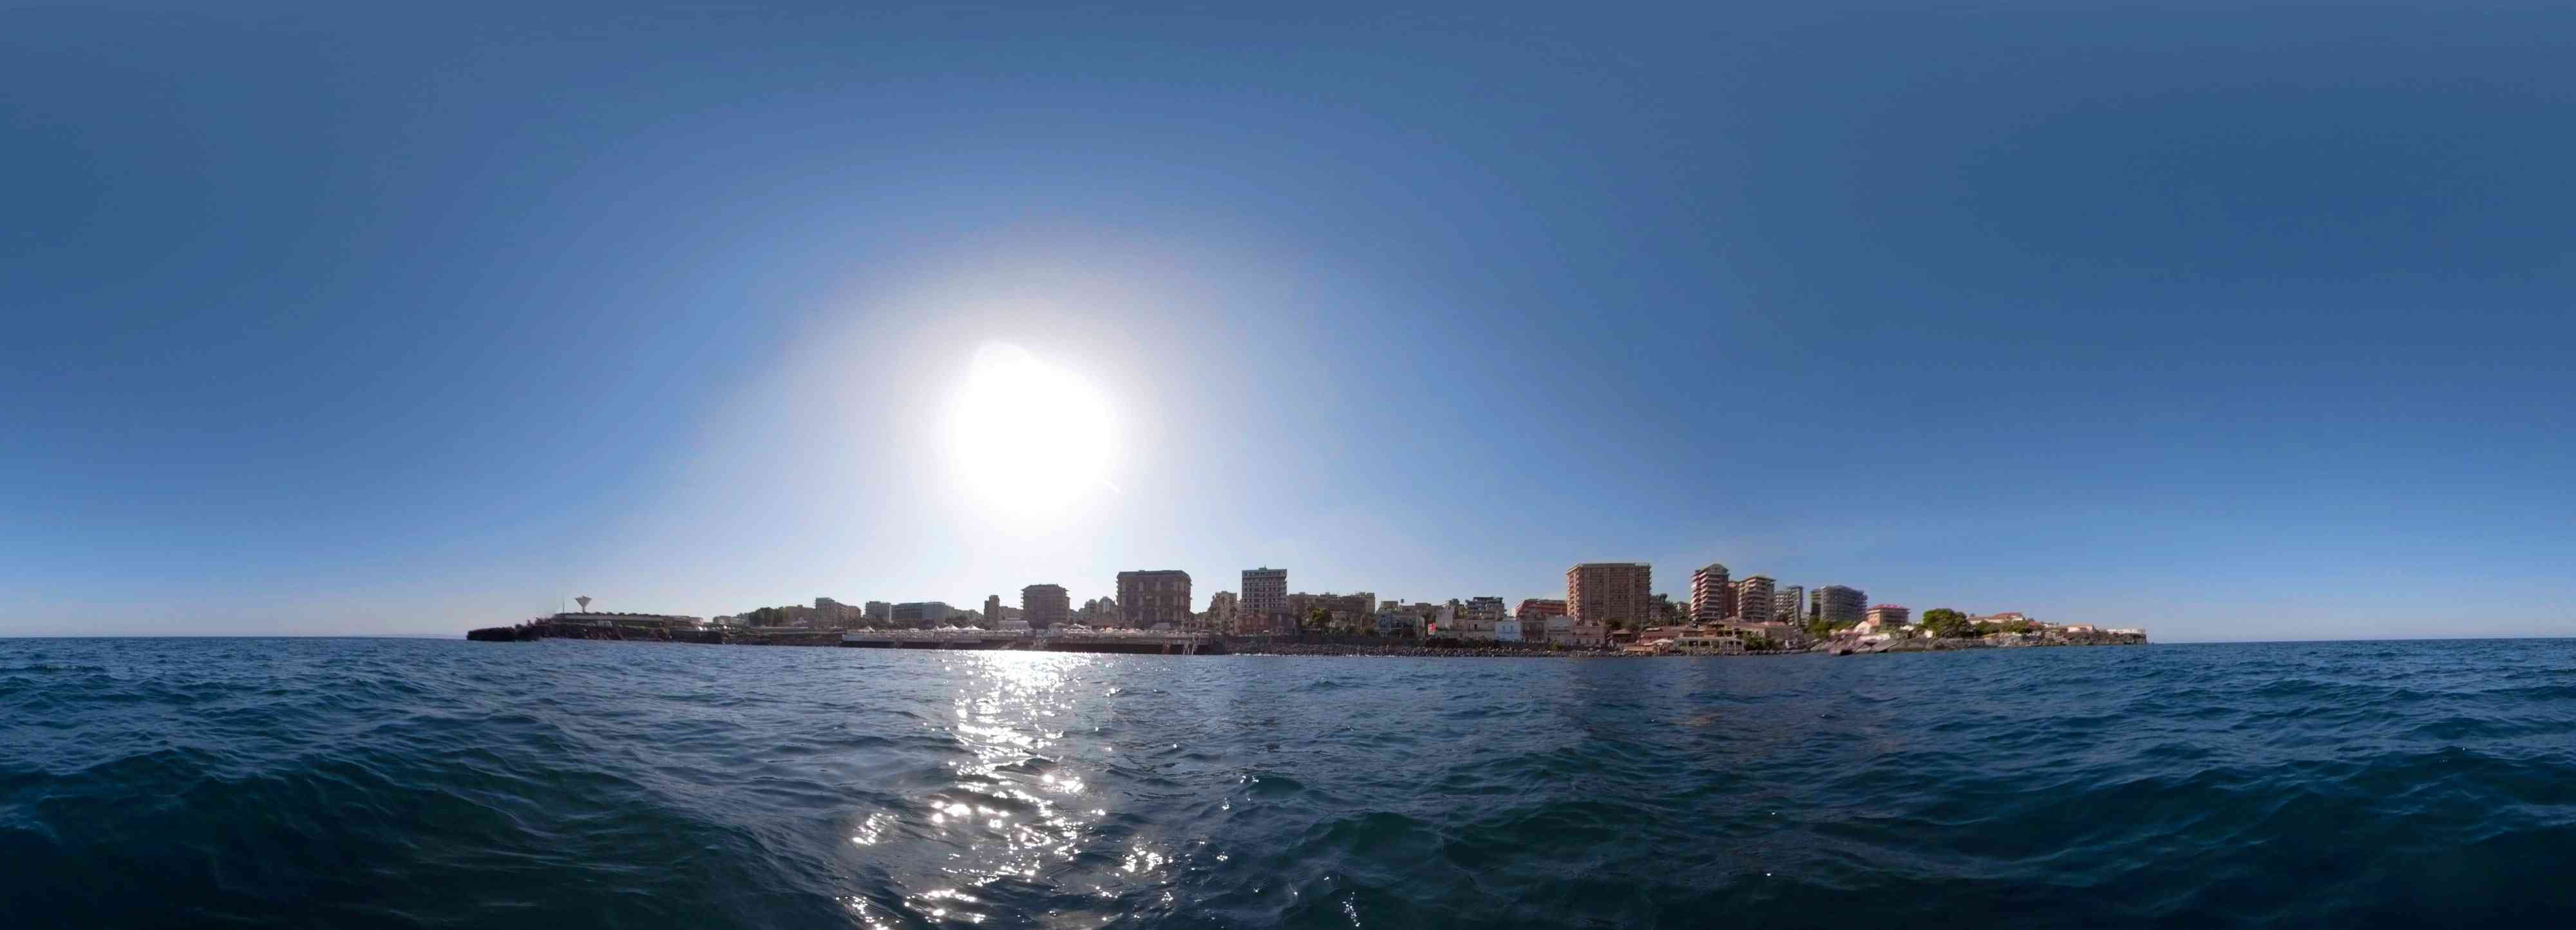 360wonders | Catania Italie | visite virtuelle 360 3D VR